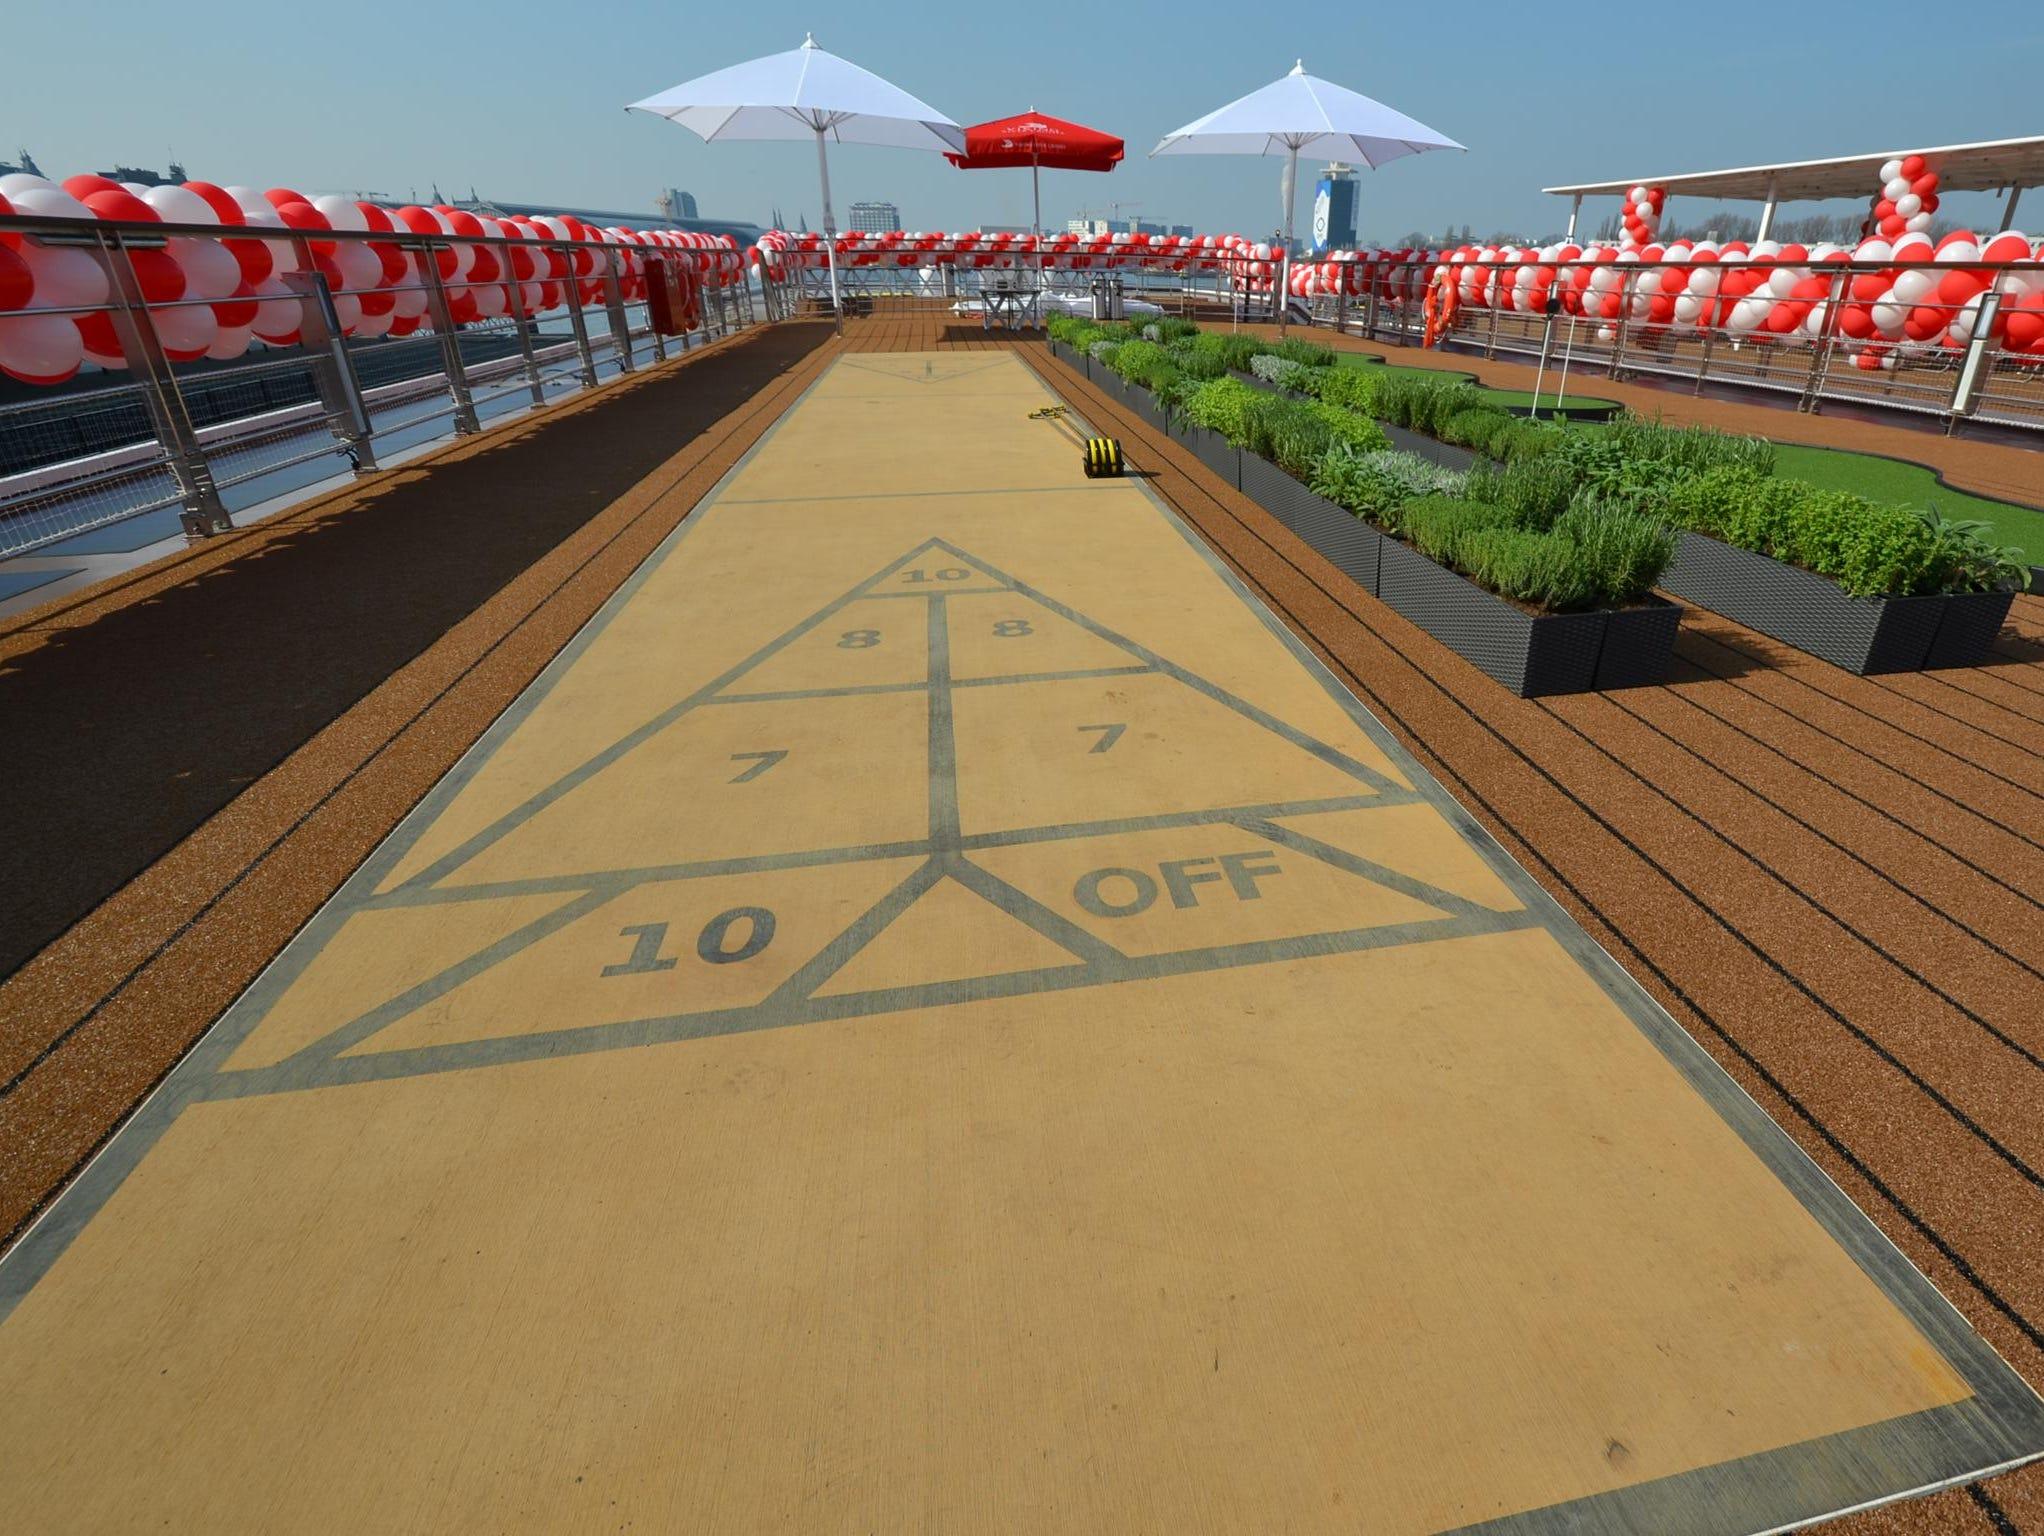 The Viking Odin's deck-top shuffleboard court.